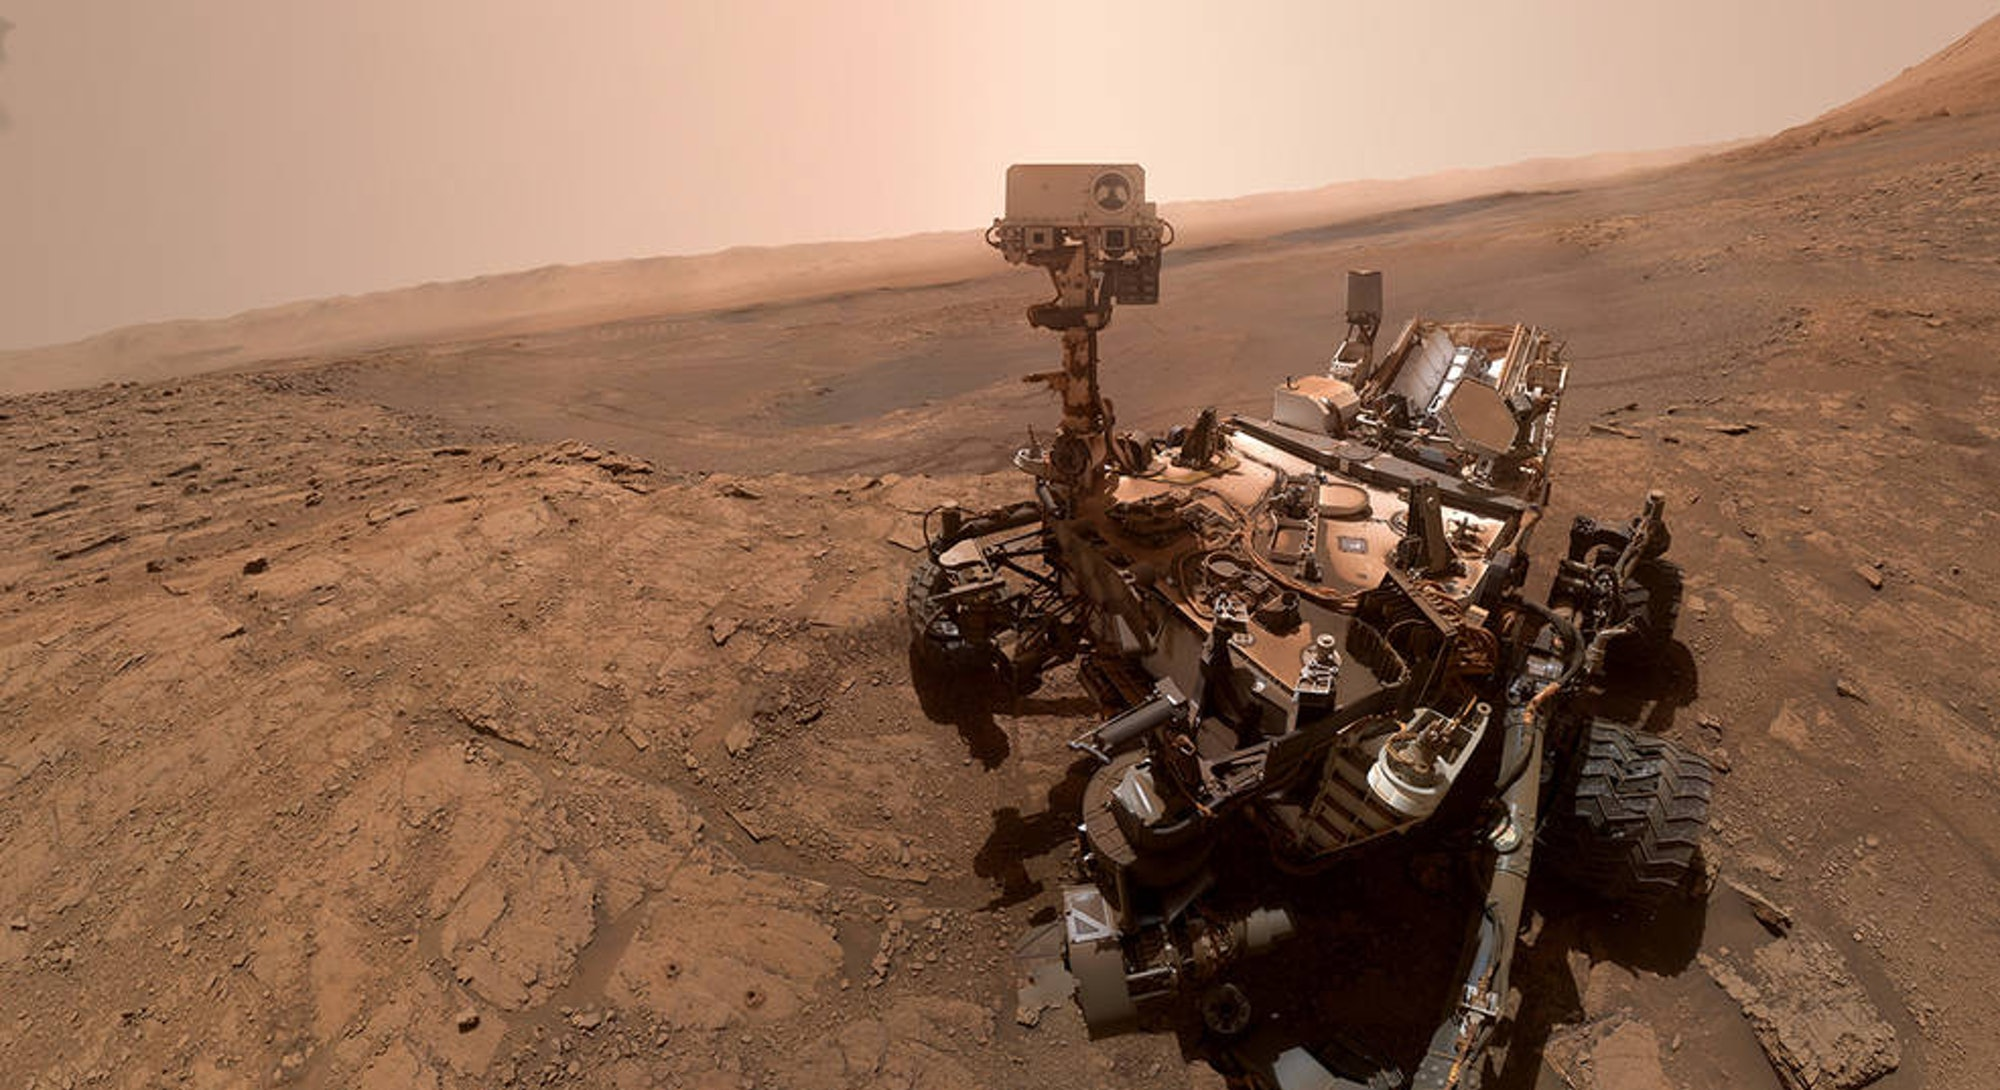 NASA curiosity rover selfie